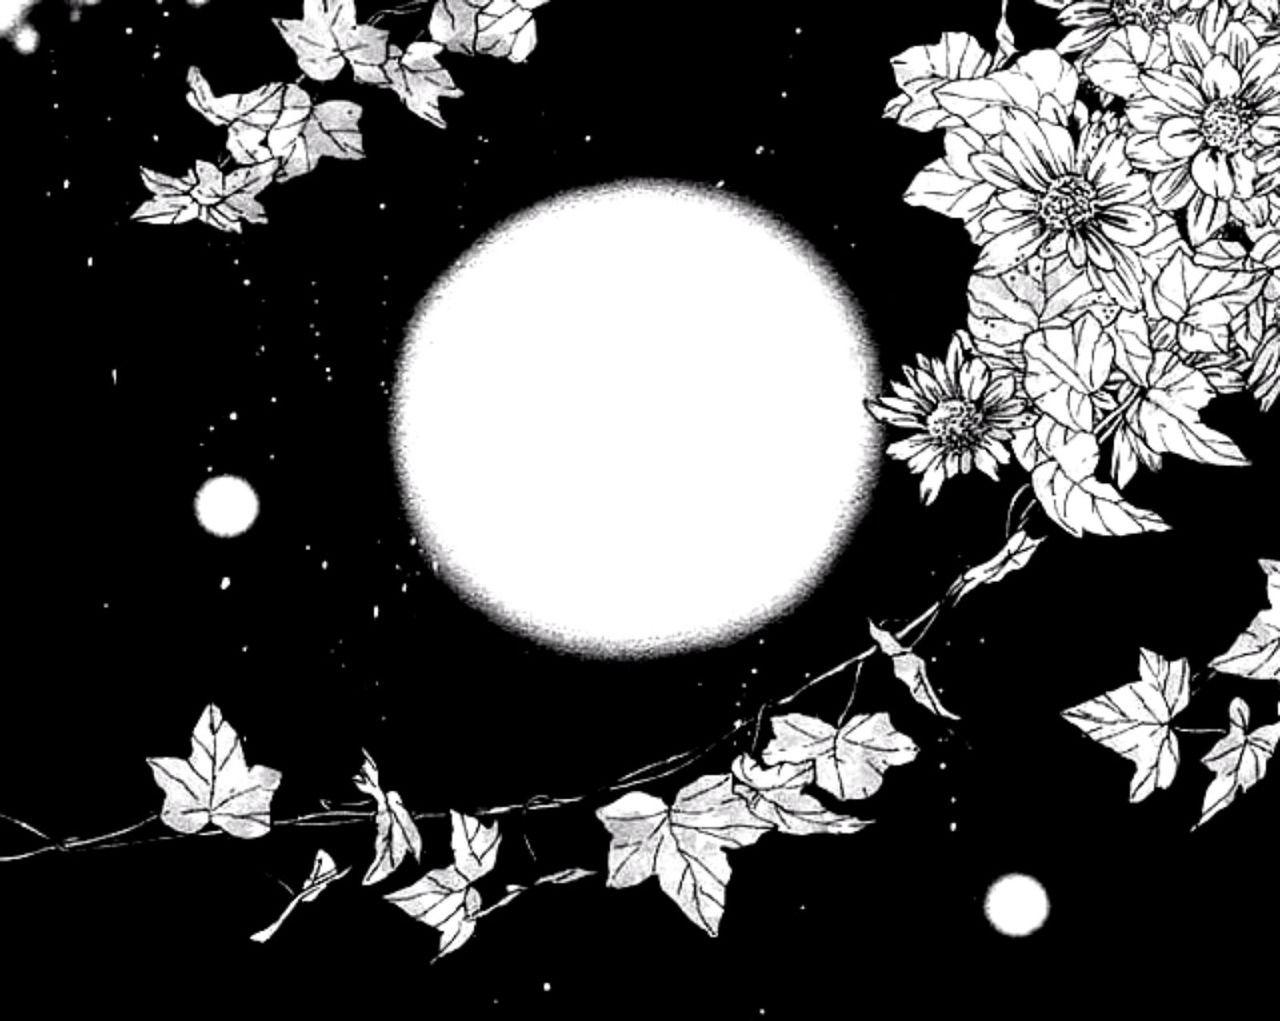 ▾ ᨑ @𝘵𝘢𝘦𝘹𝘴𝘸﹆. ۰ ⸼ ۫ 🍃   Anime background, Flowery wallpaper, Vintage  poster design